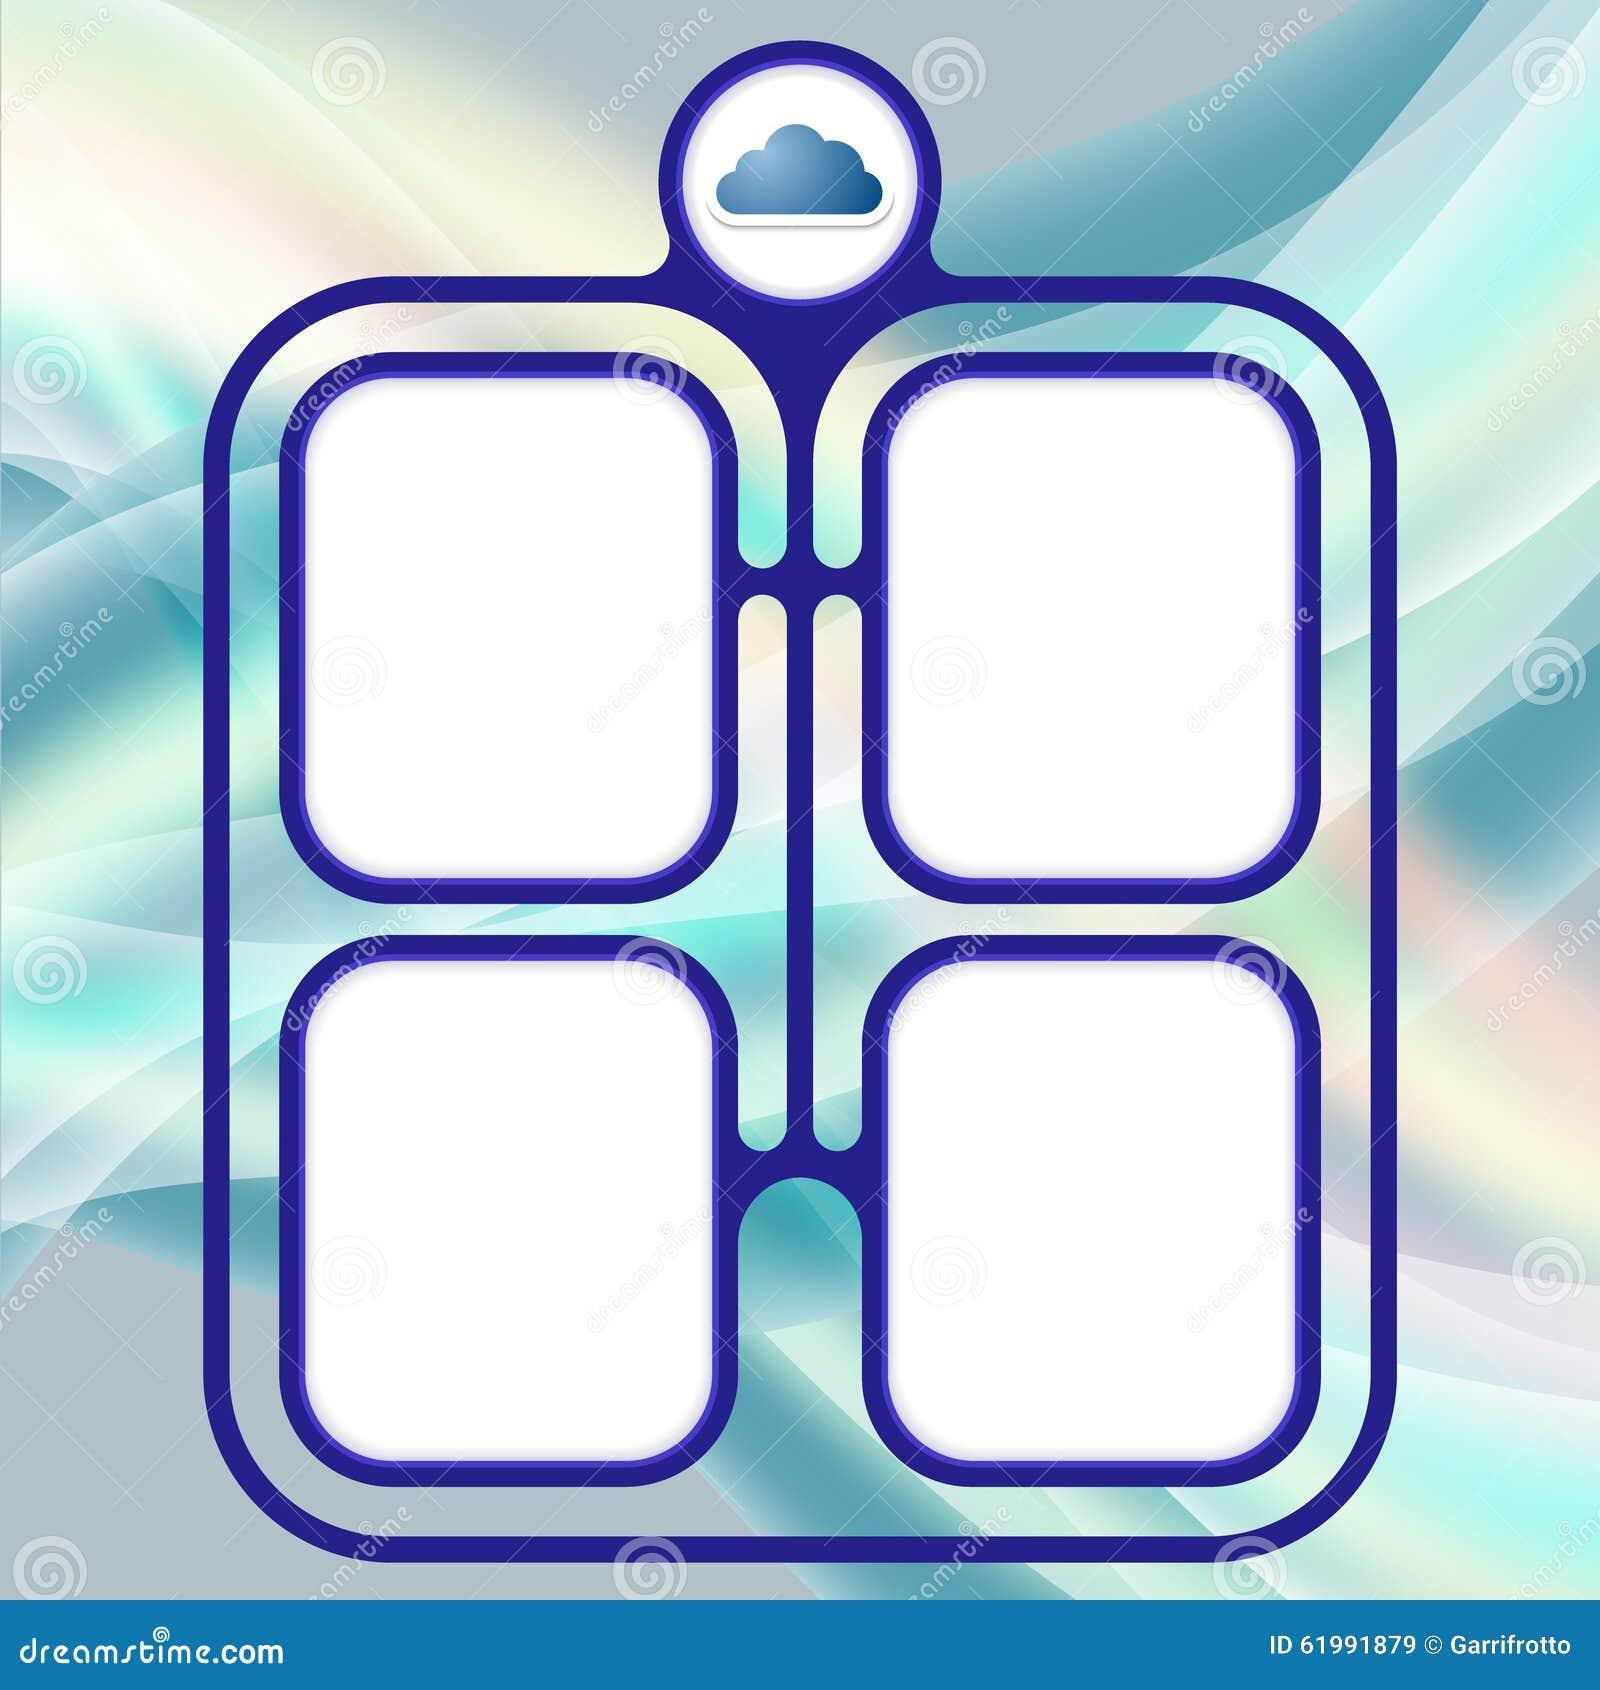 Connected frames stock illustration. Illustration of message - 61991879